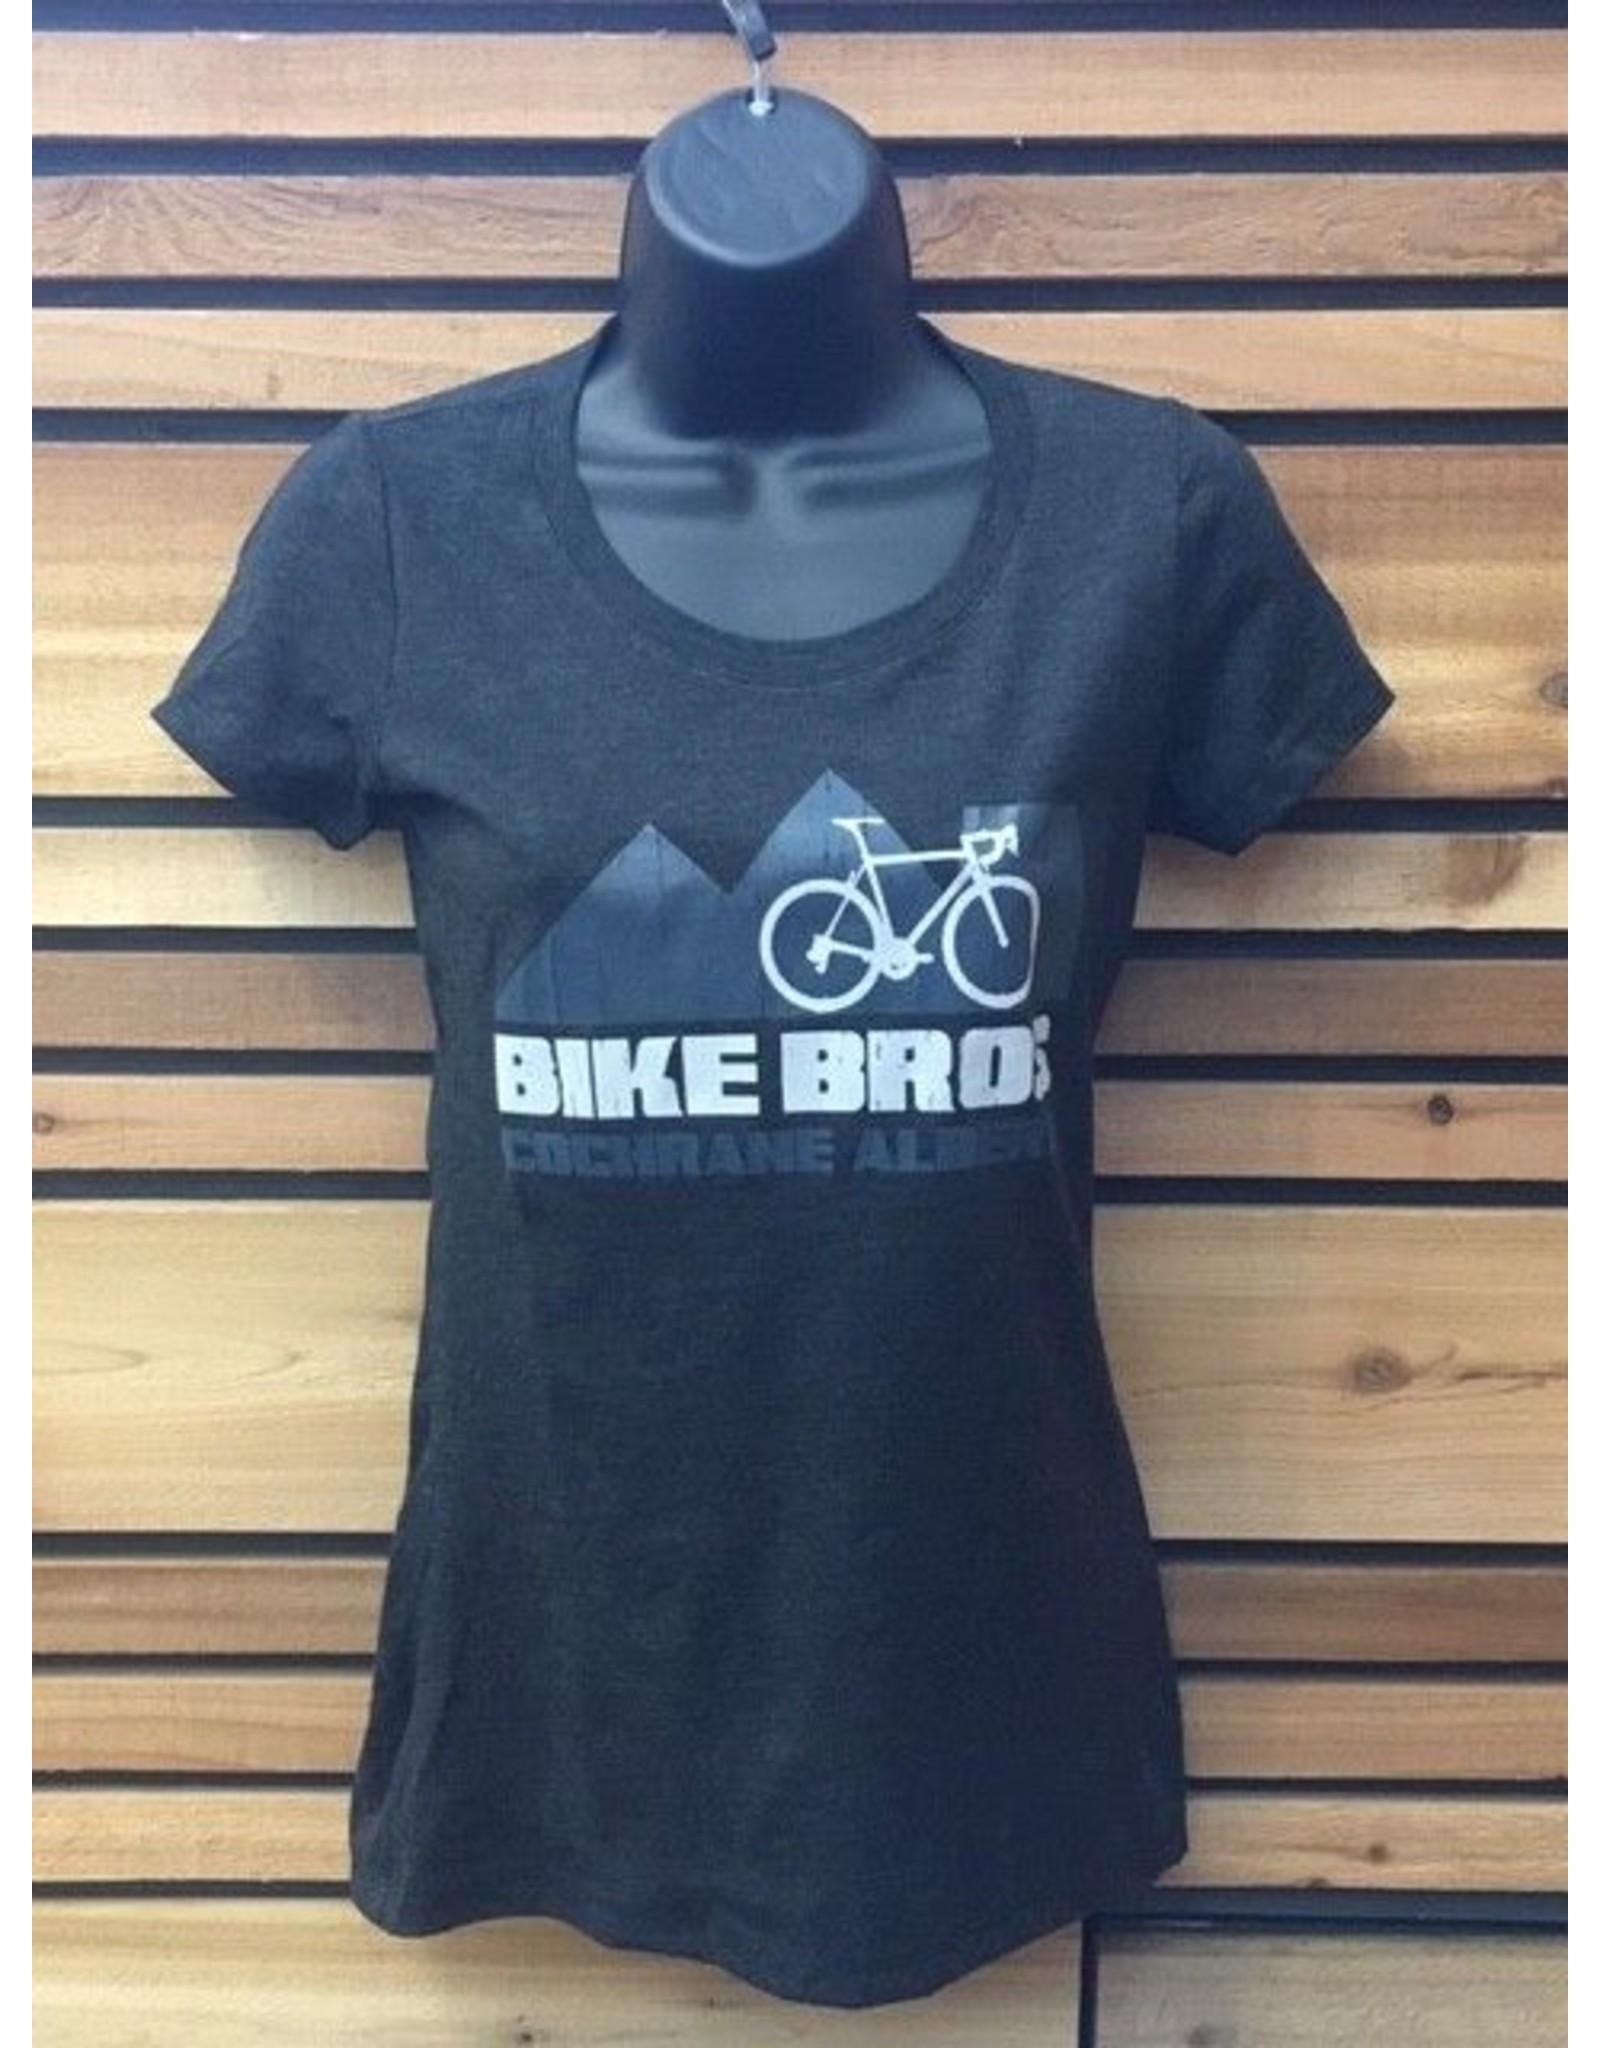 Bike Bros. Road Bike with mountains T Shirt Bike Bros